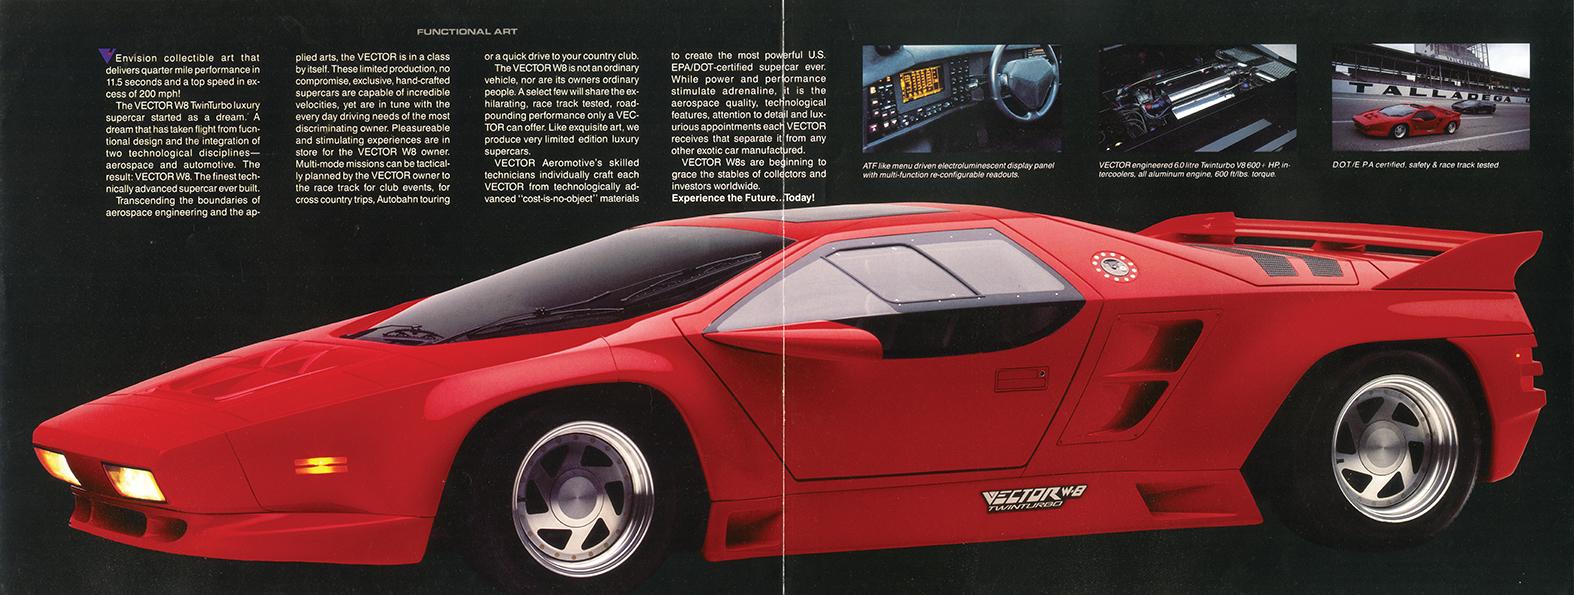 Vector W8 brosjyre